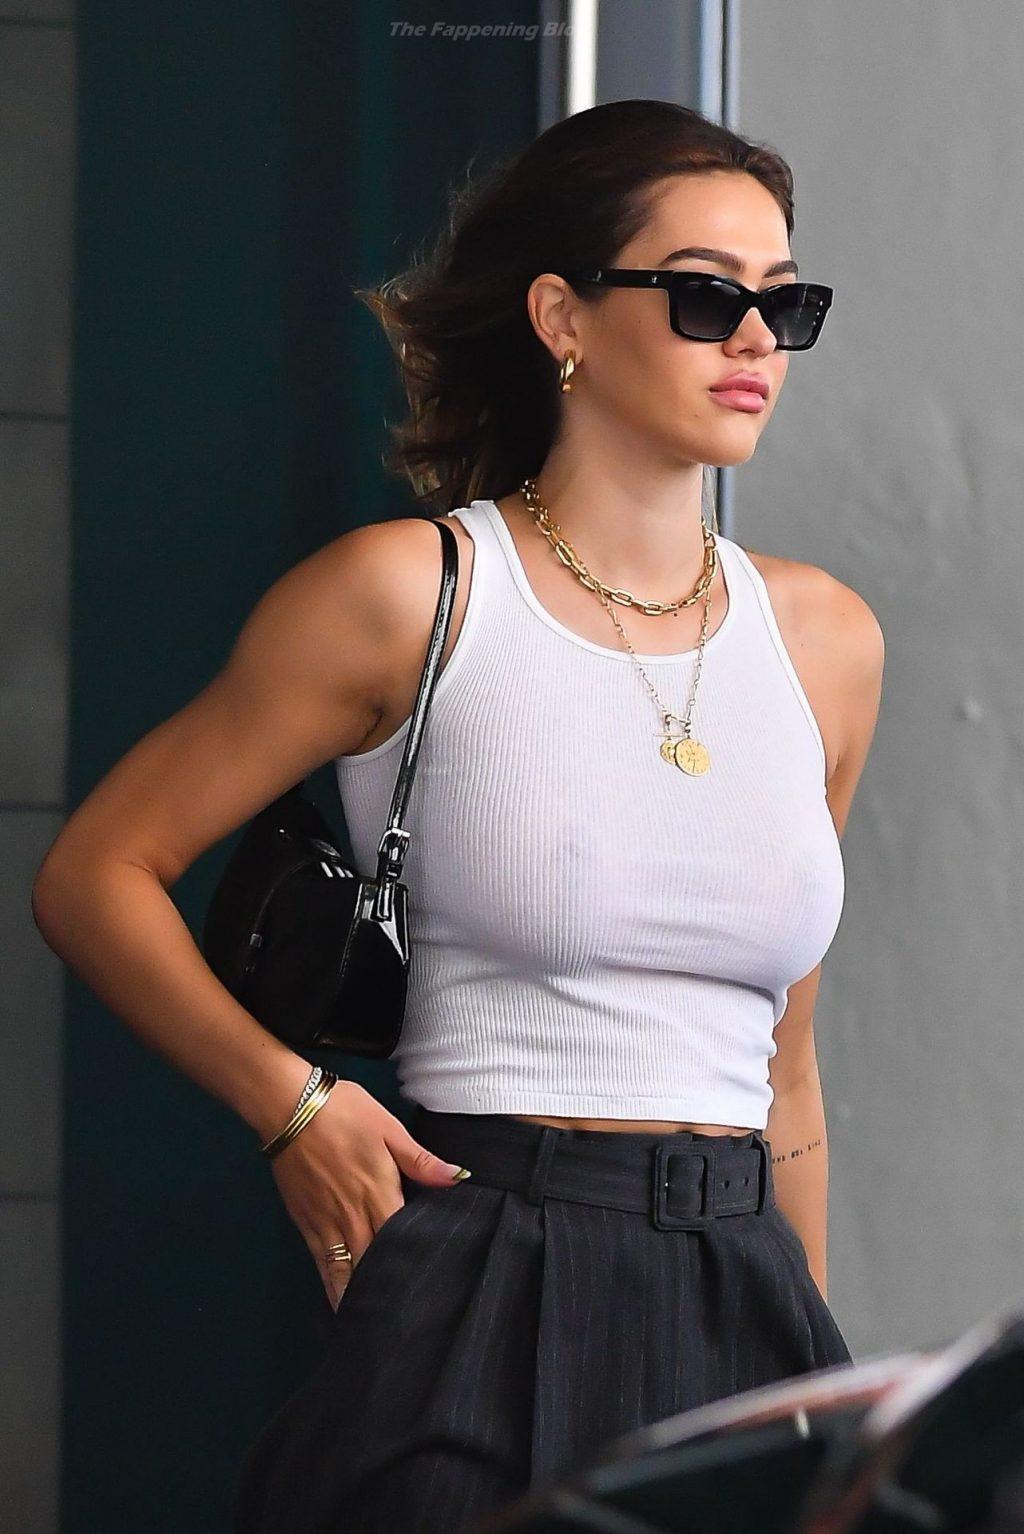 Amelia Hamlin is Seen Braless in Miami (18 Photos)